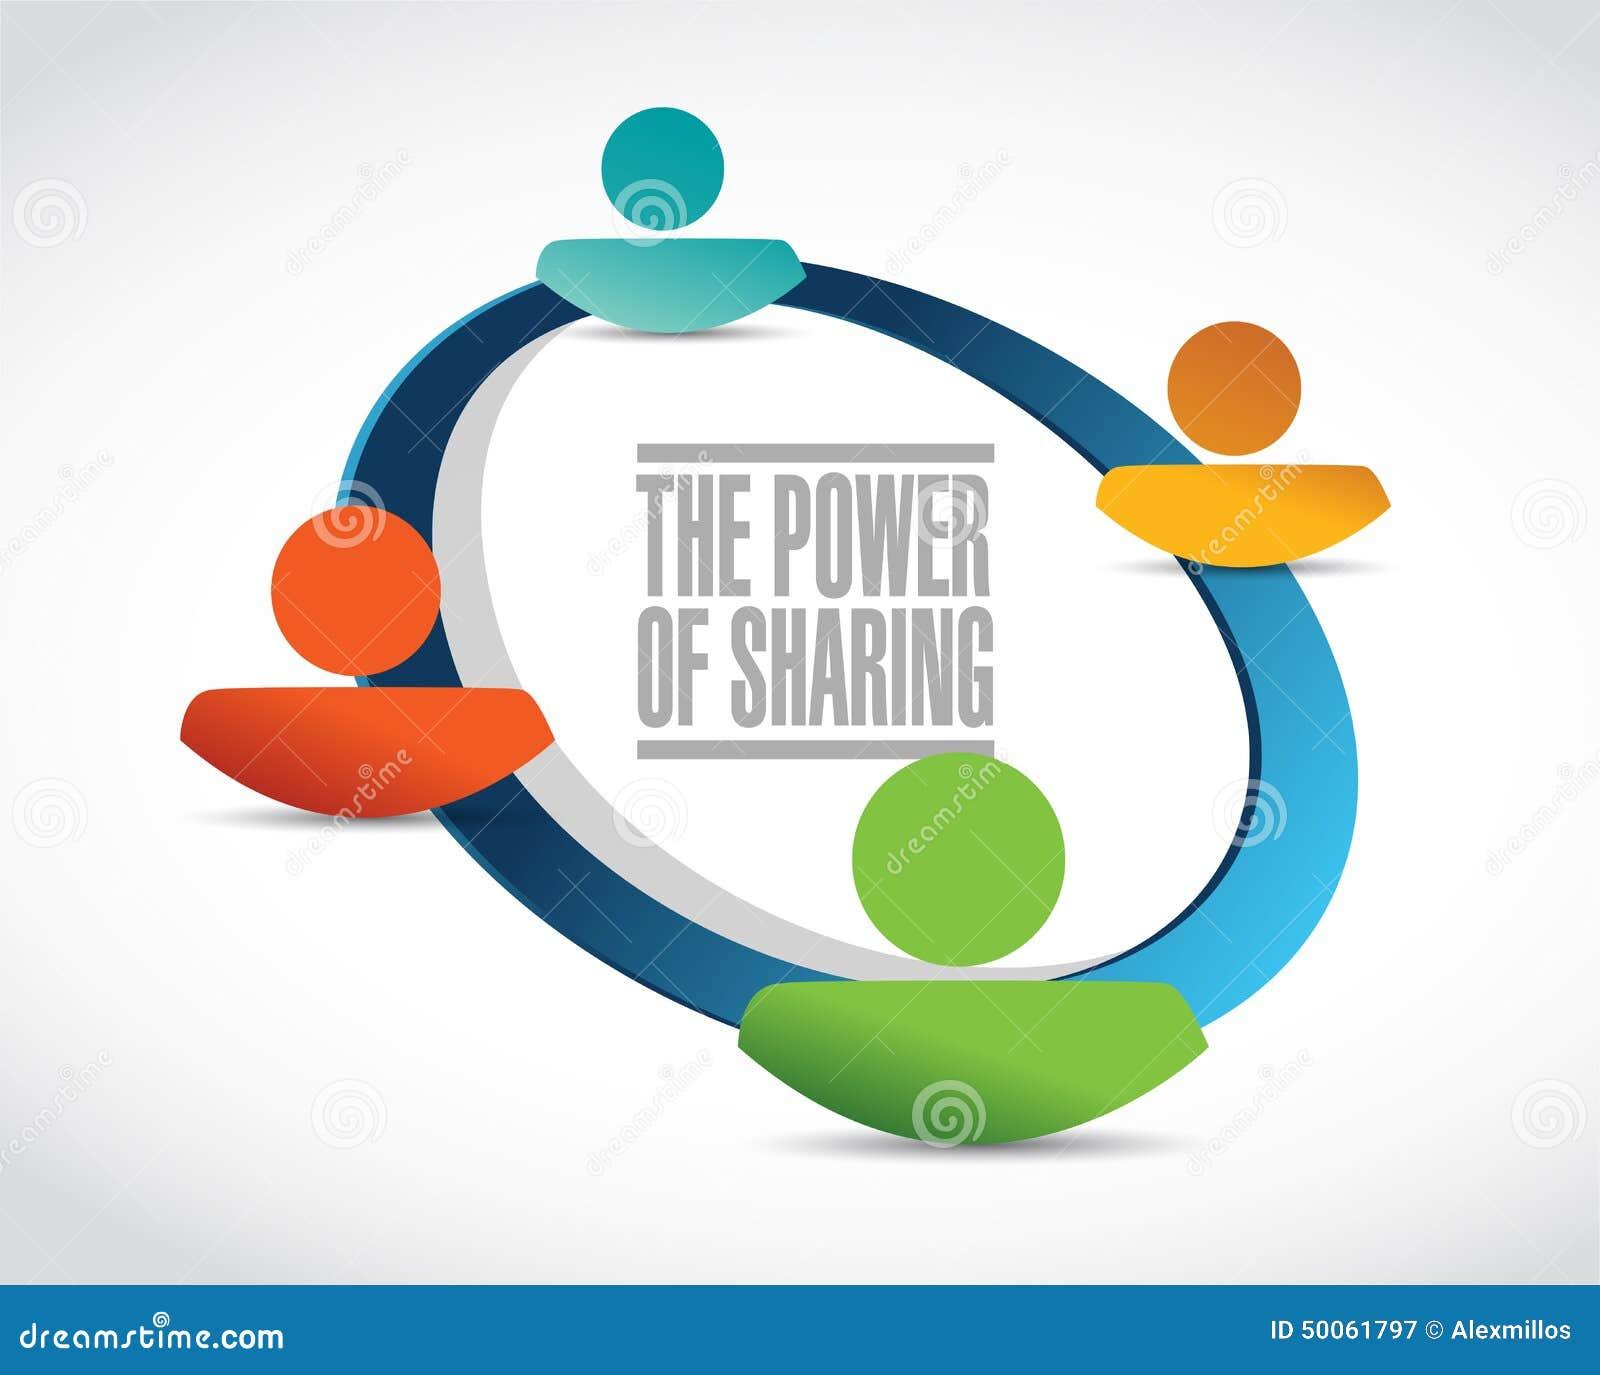 The Power Of Sharing Team Illustration Stock Illustration